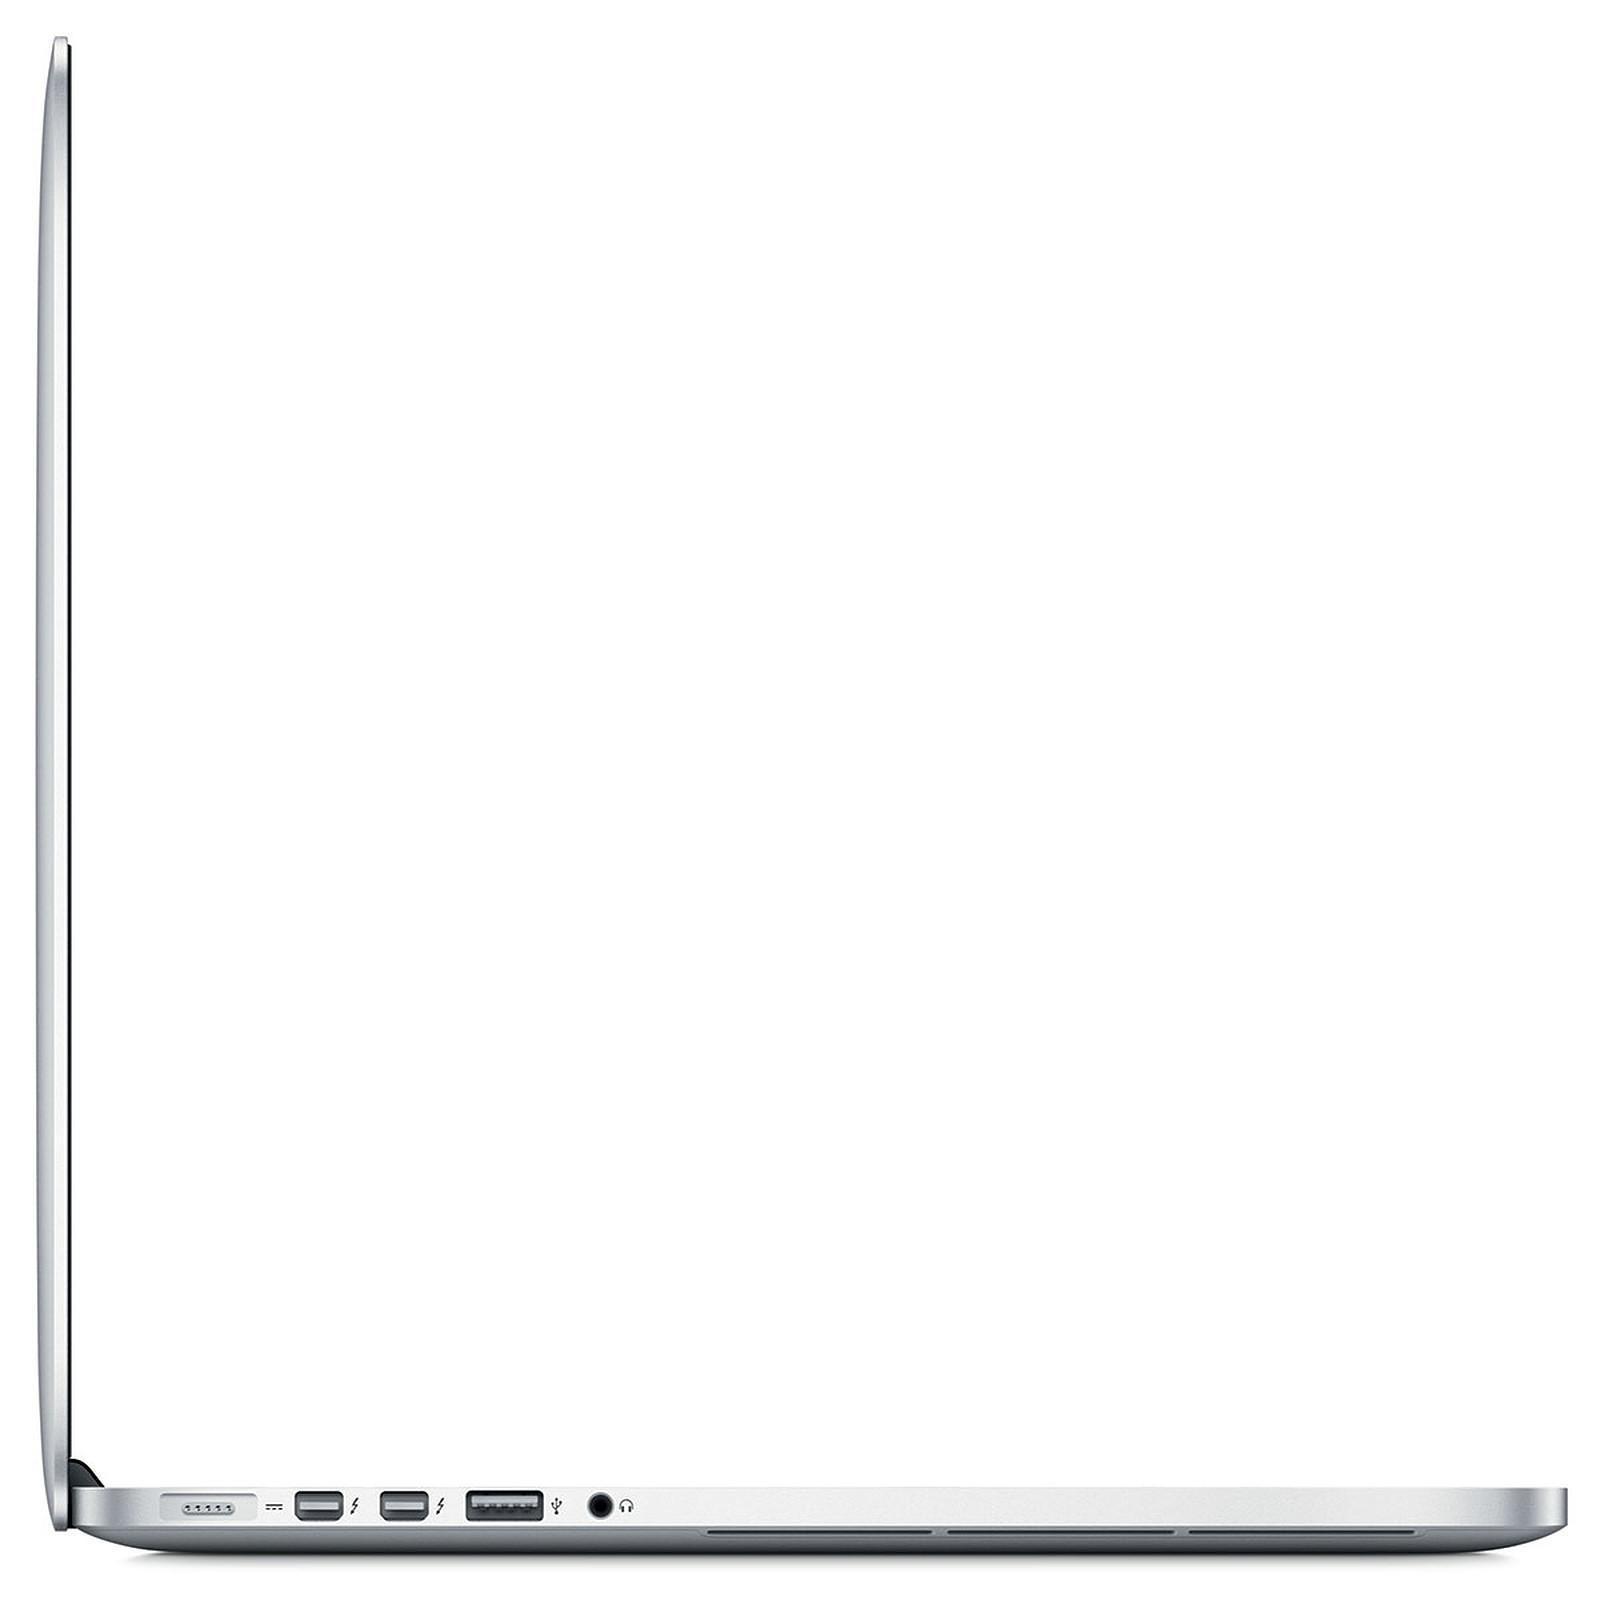 MacBook Pro Retina 15.4-inch (2015) - Core i7 - 16GB - SSD 256 GB QWERTY